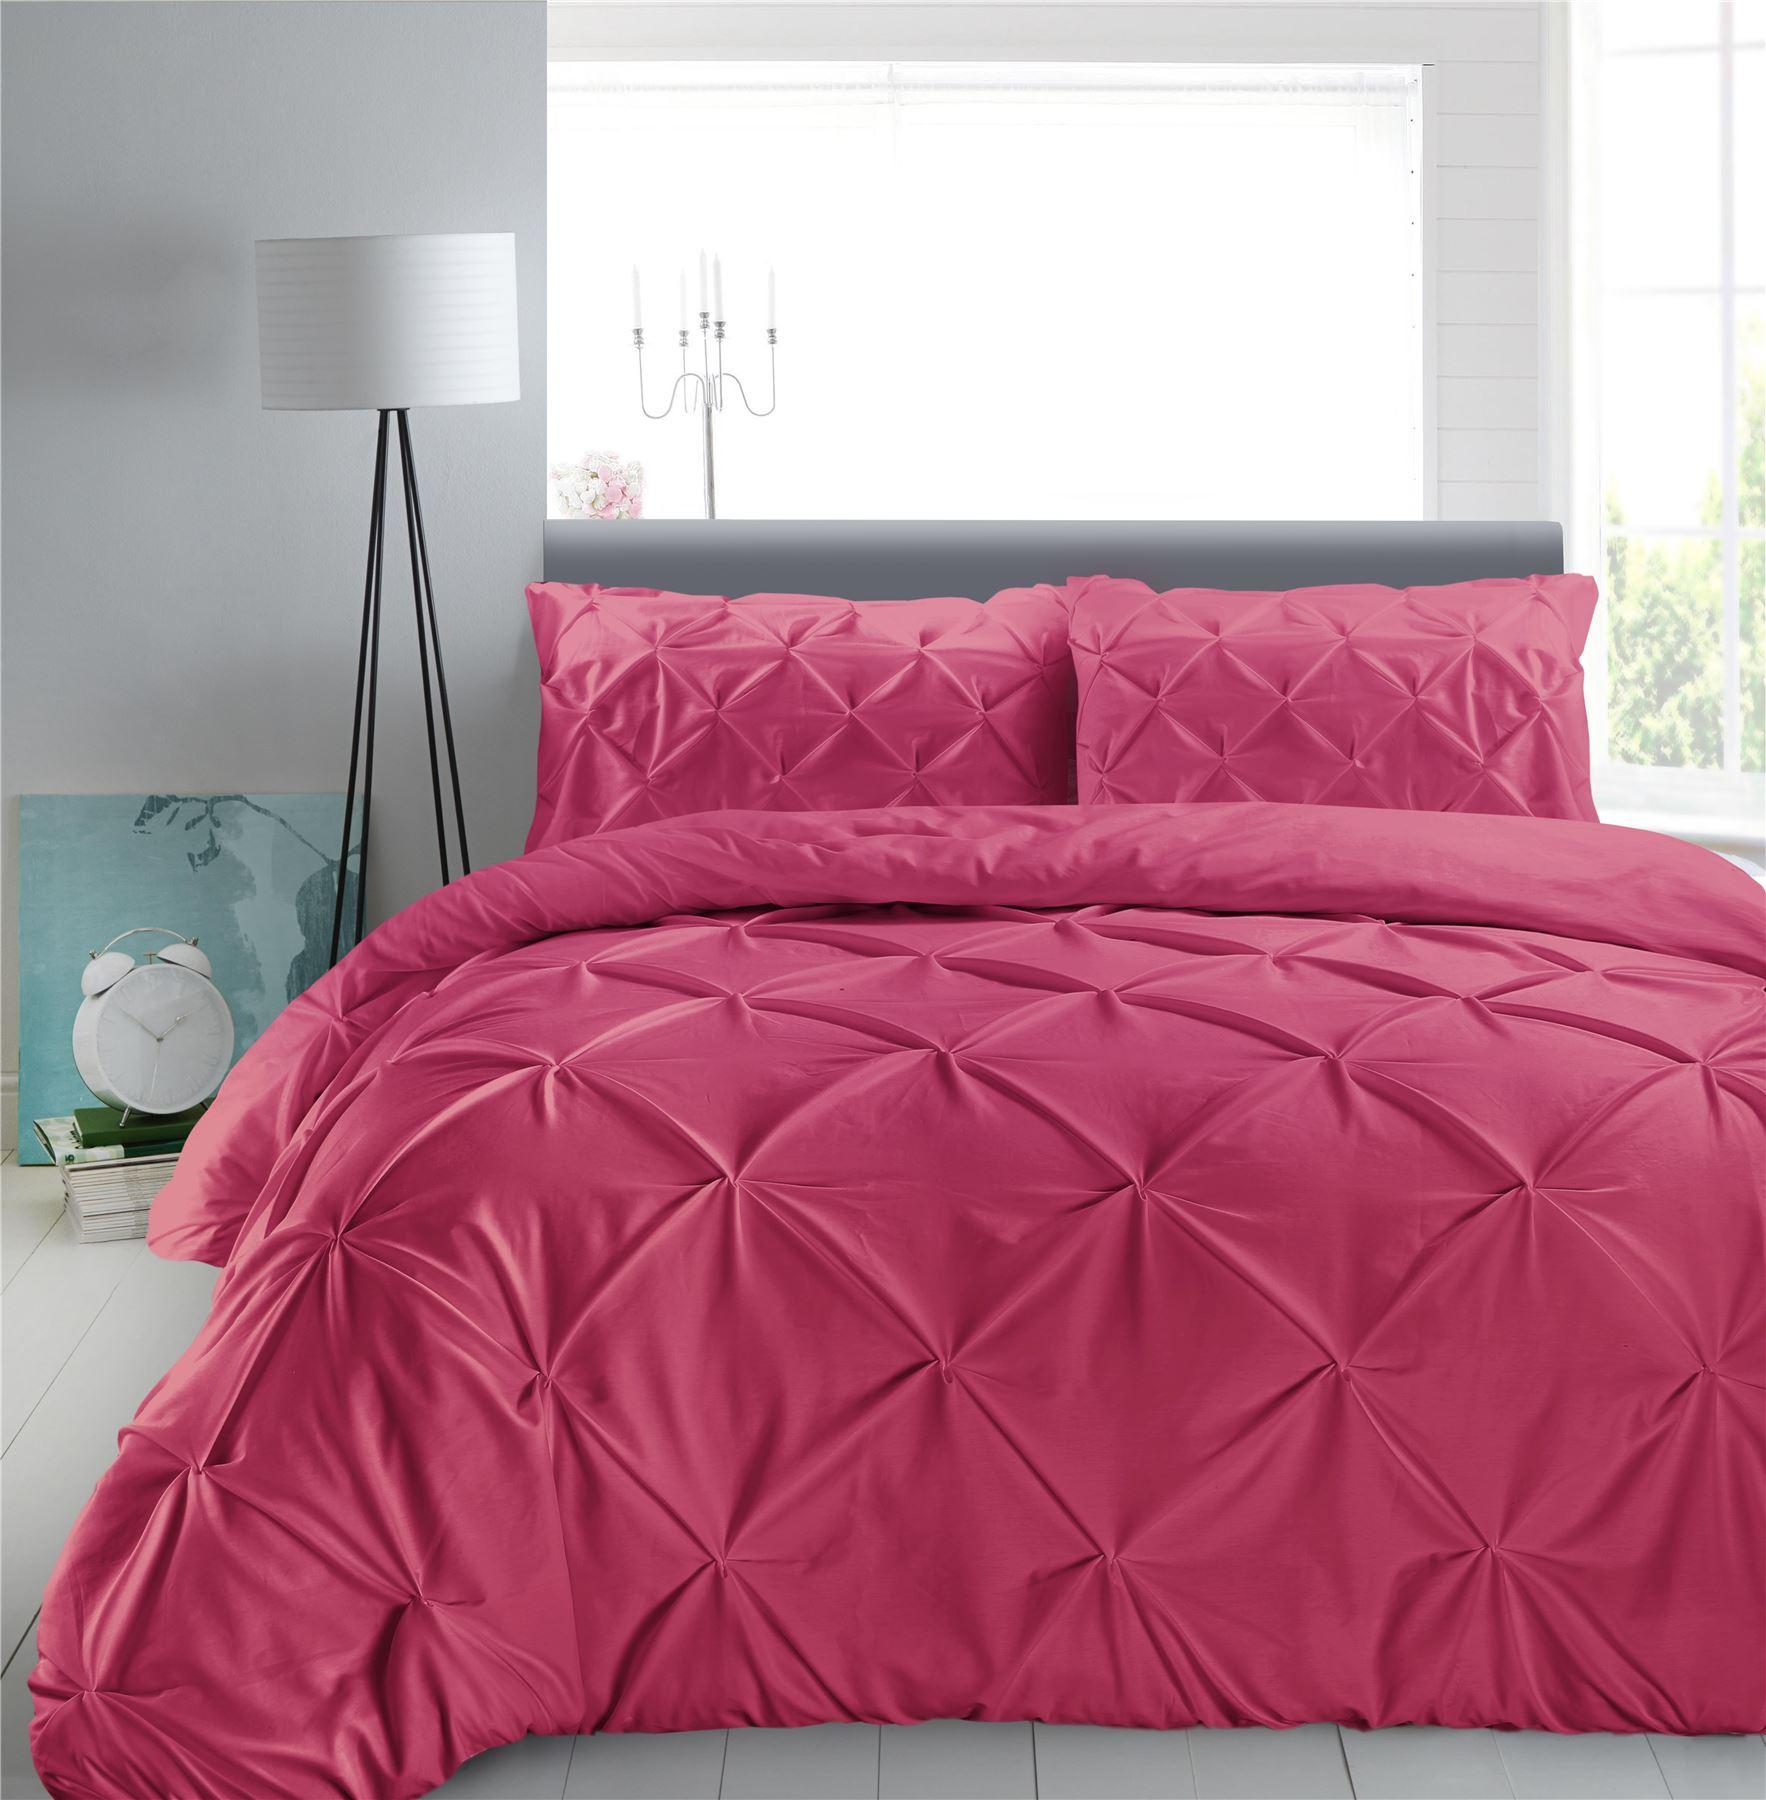 Luxury-Pure-100-Cotton-200-Thread-Pinch-Pleat-Pintuck-Puckering-Duvet-Cover-Set thumbnail 37